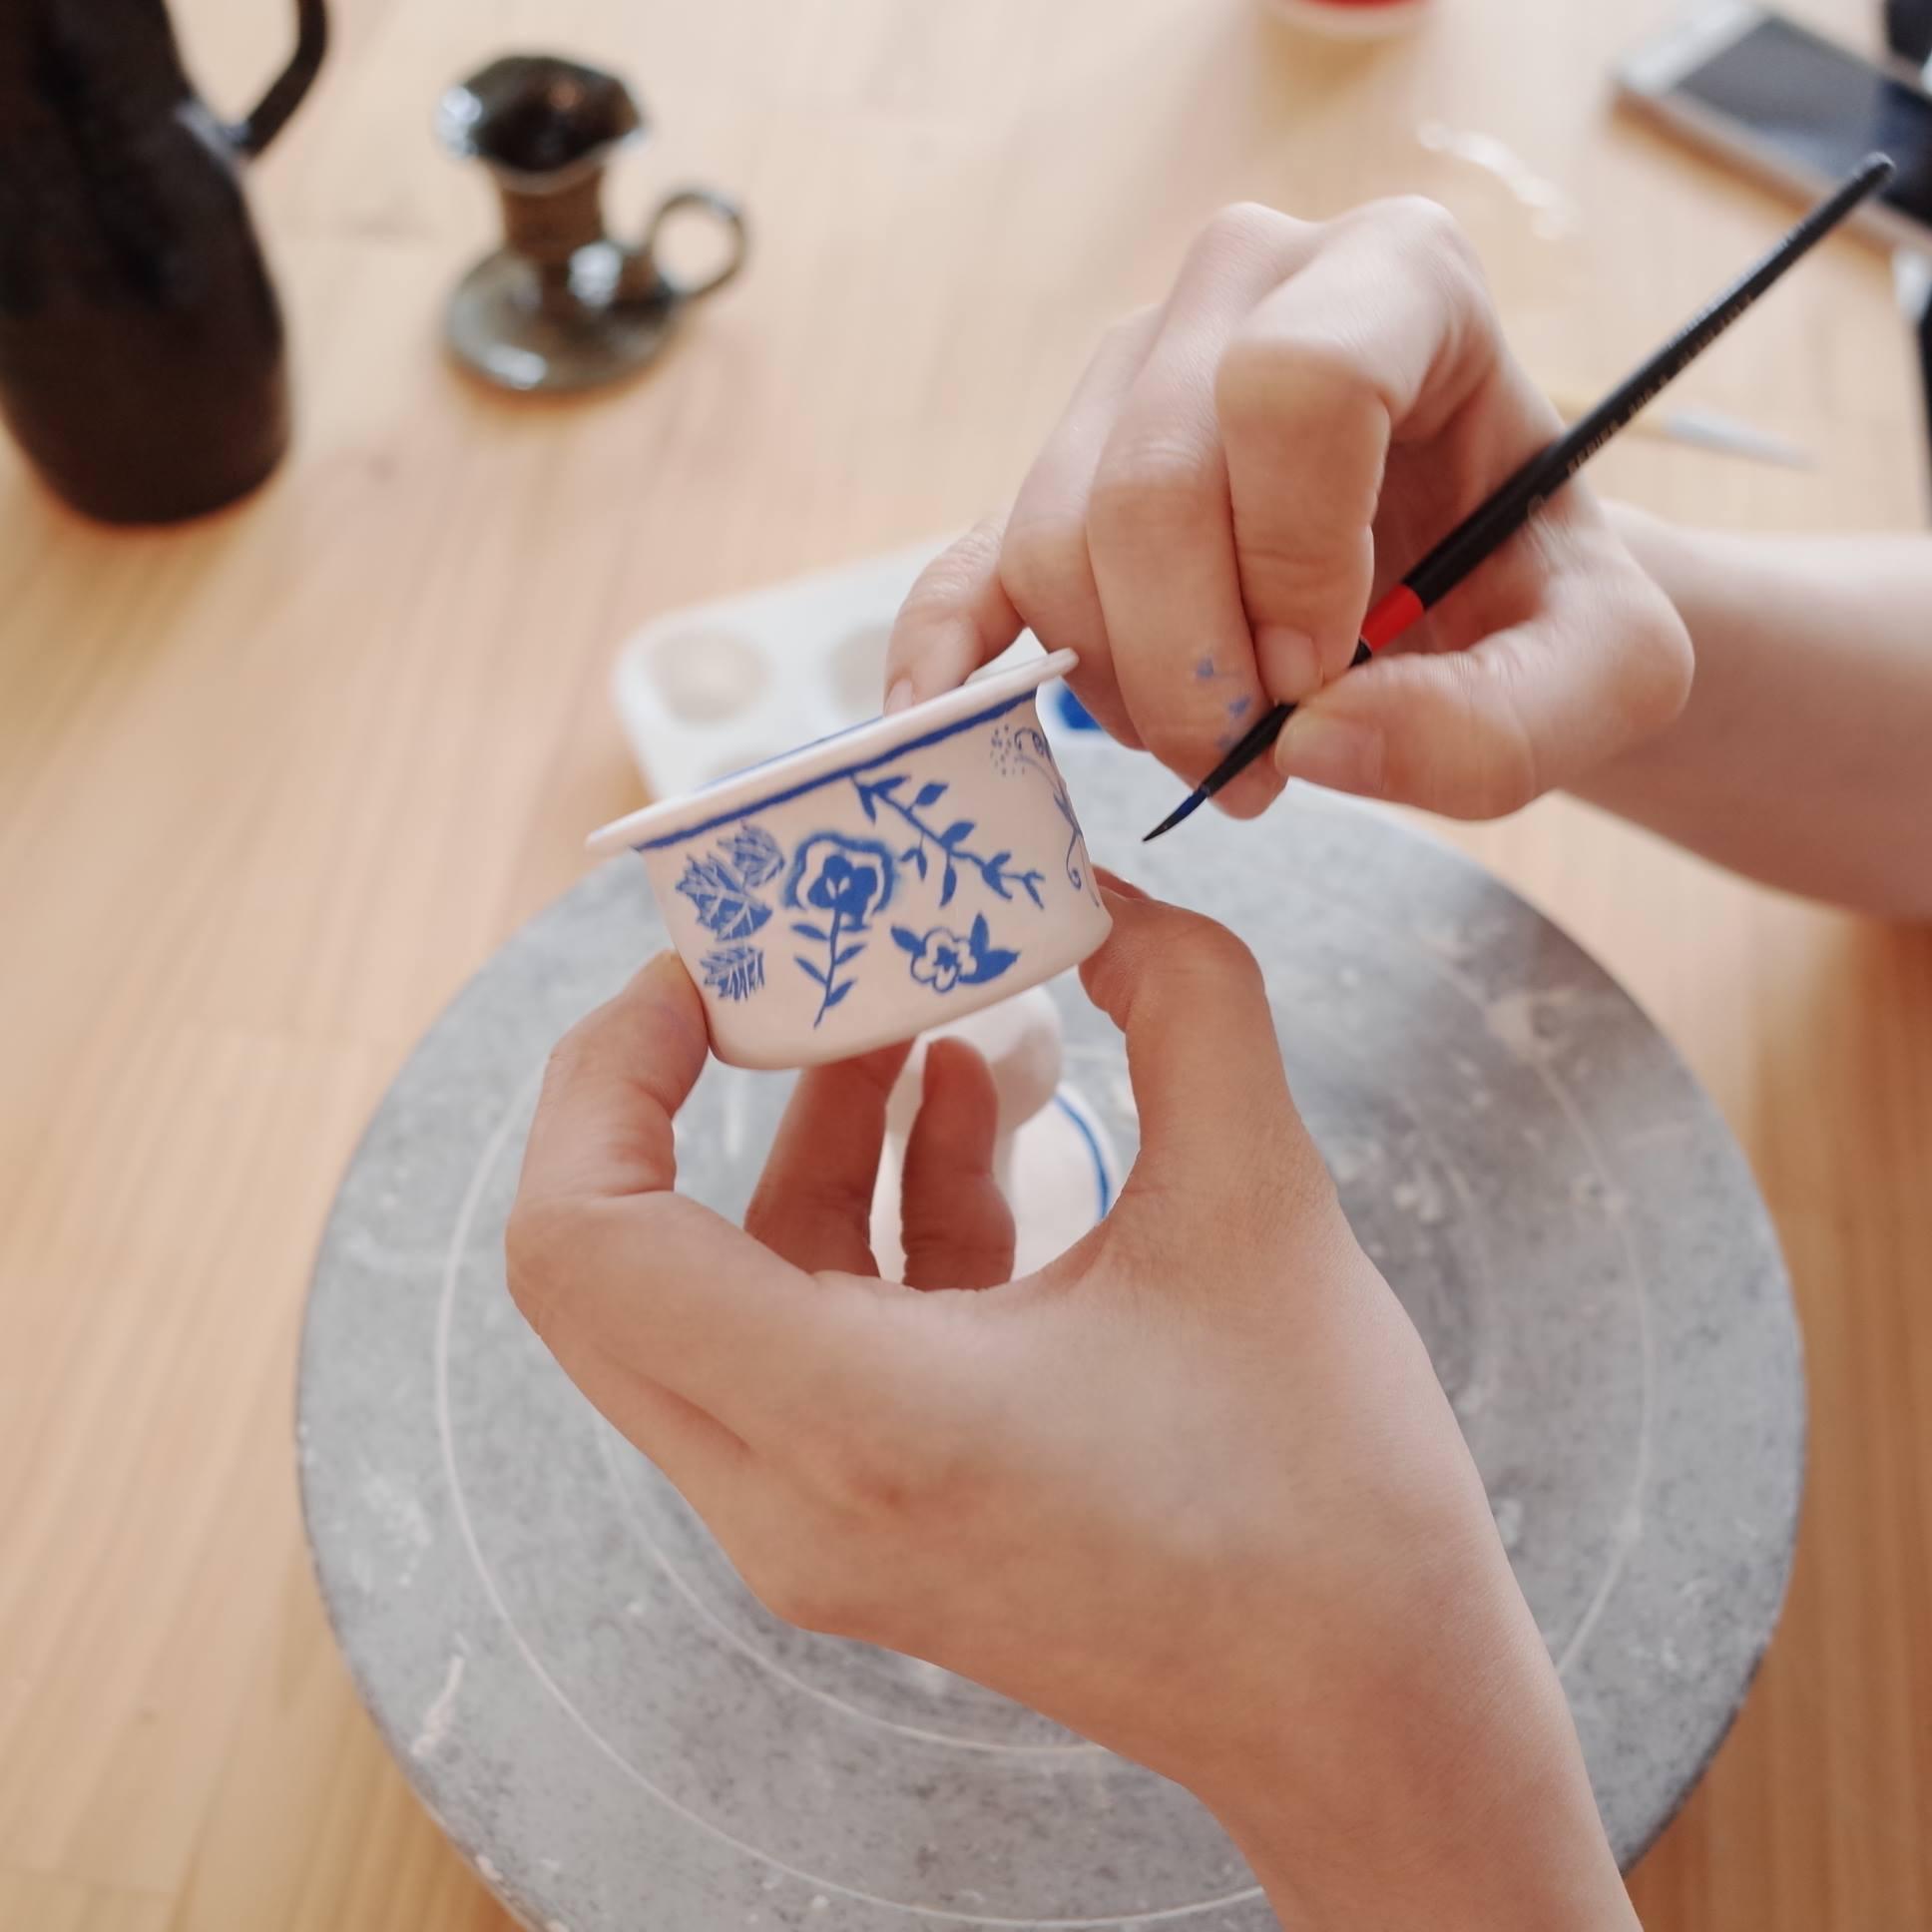 Lớp học làm gốm Sài Gòn-Haru Craft elledecoration vn 10